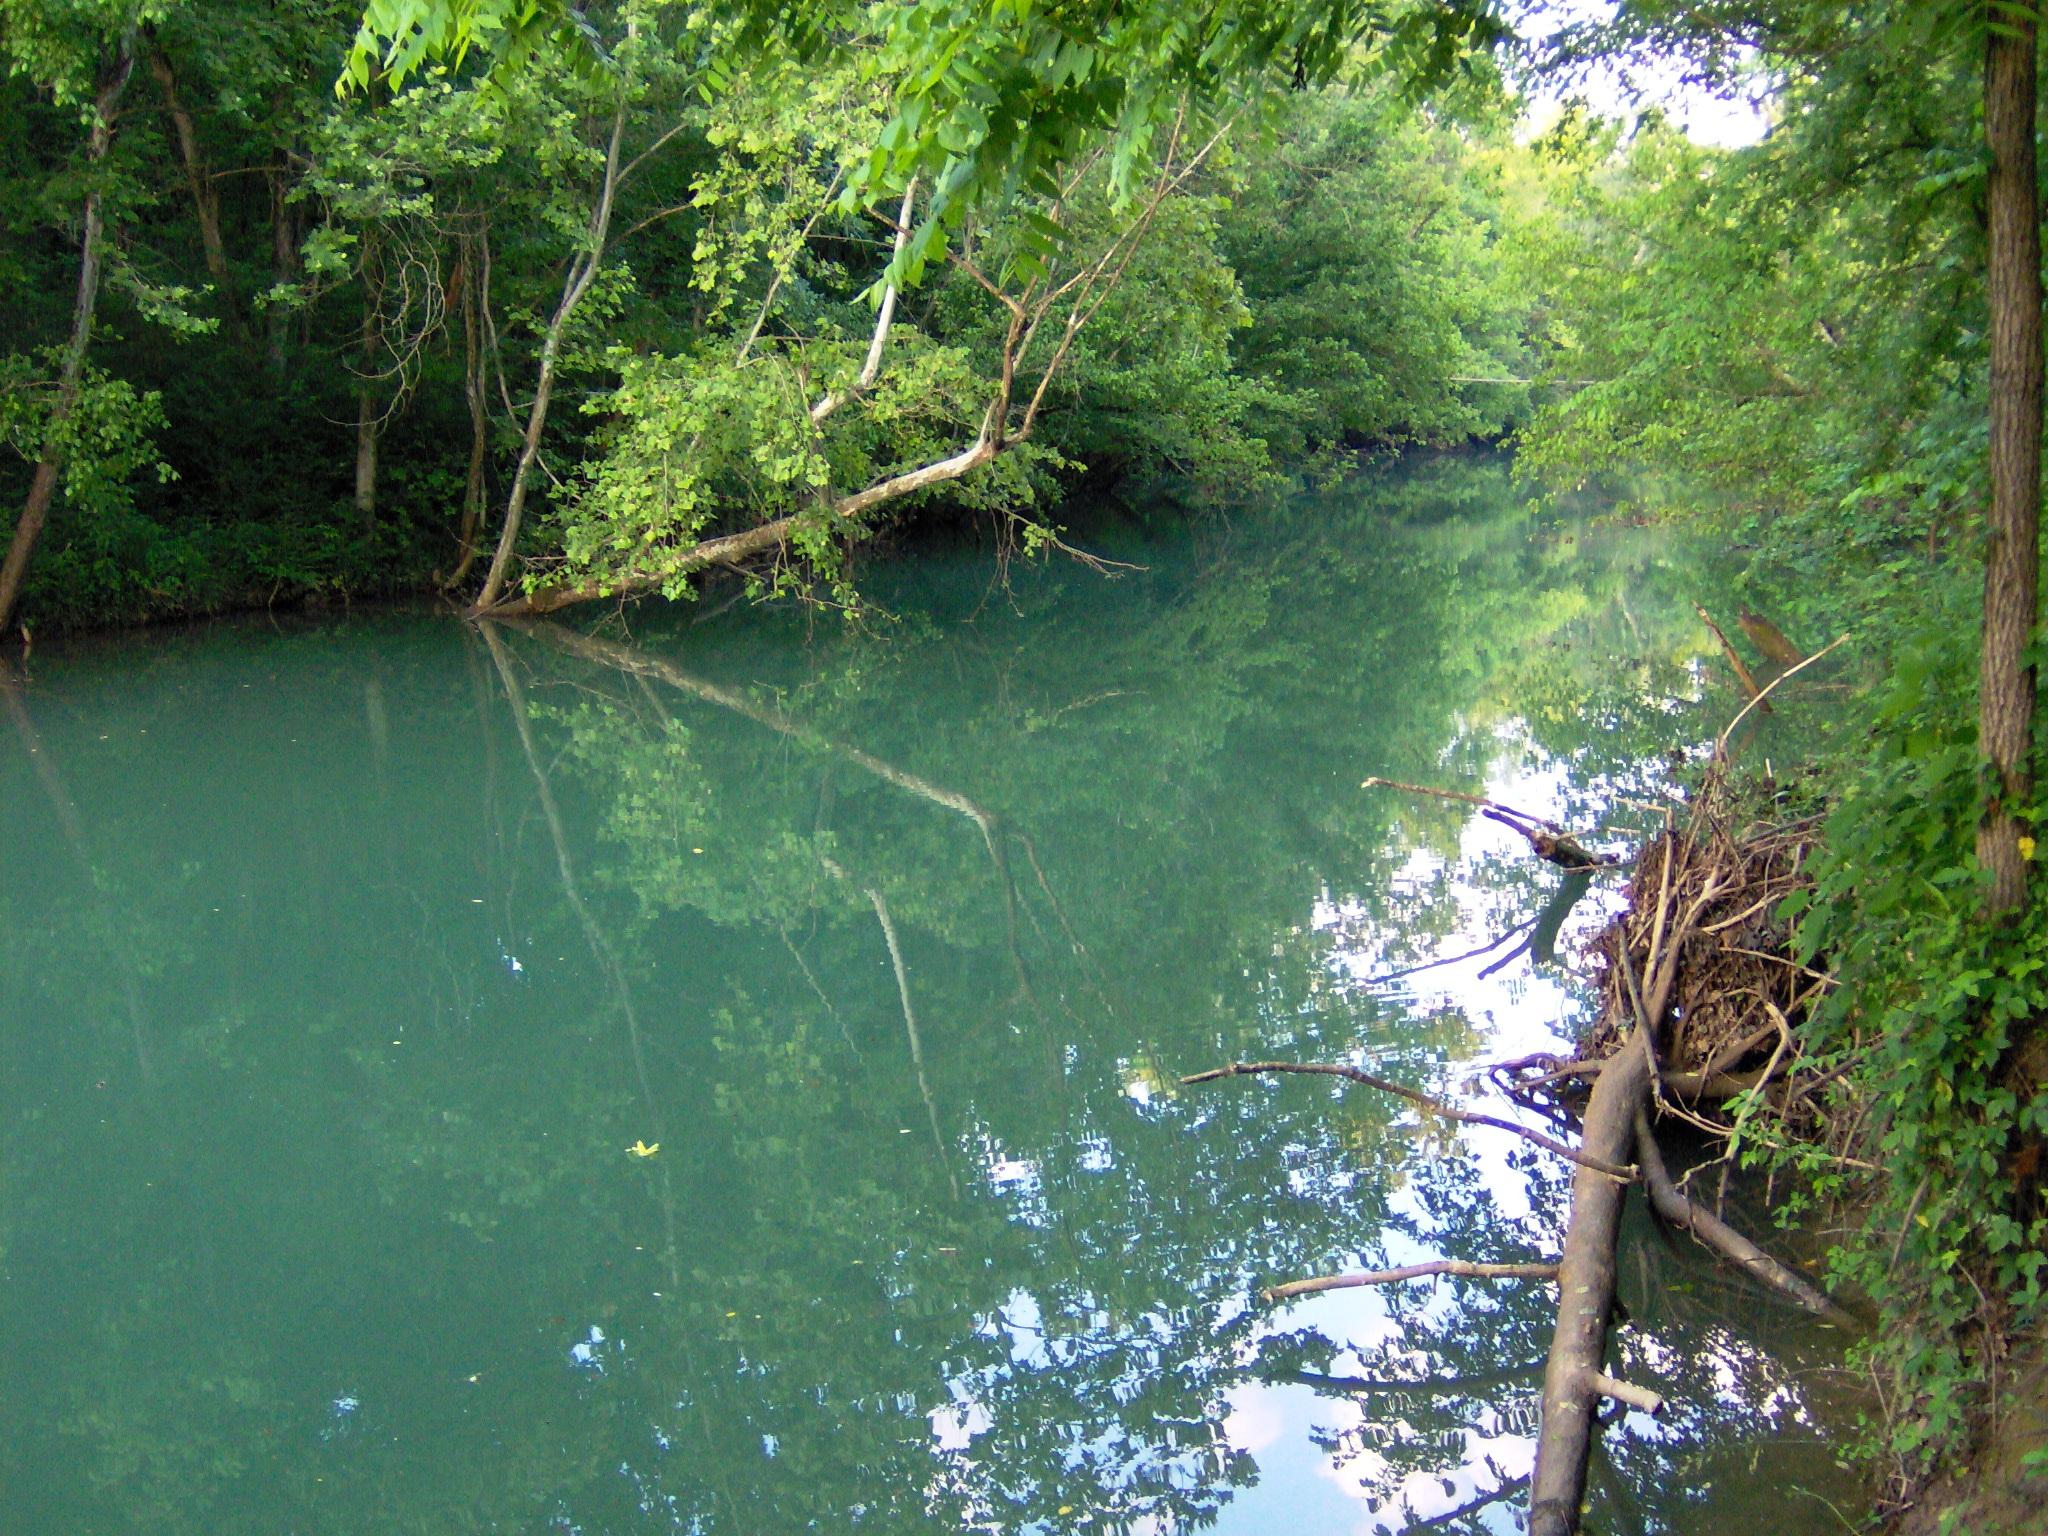 Wolf River - Pall Mall, TN - Bowling Green Canoe and Kayak ...